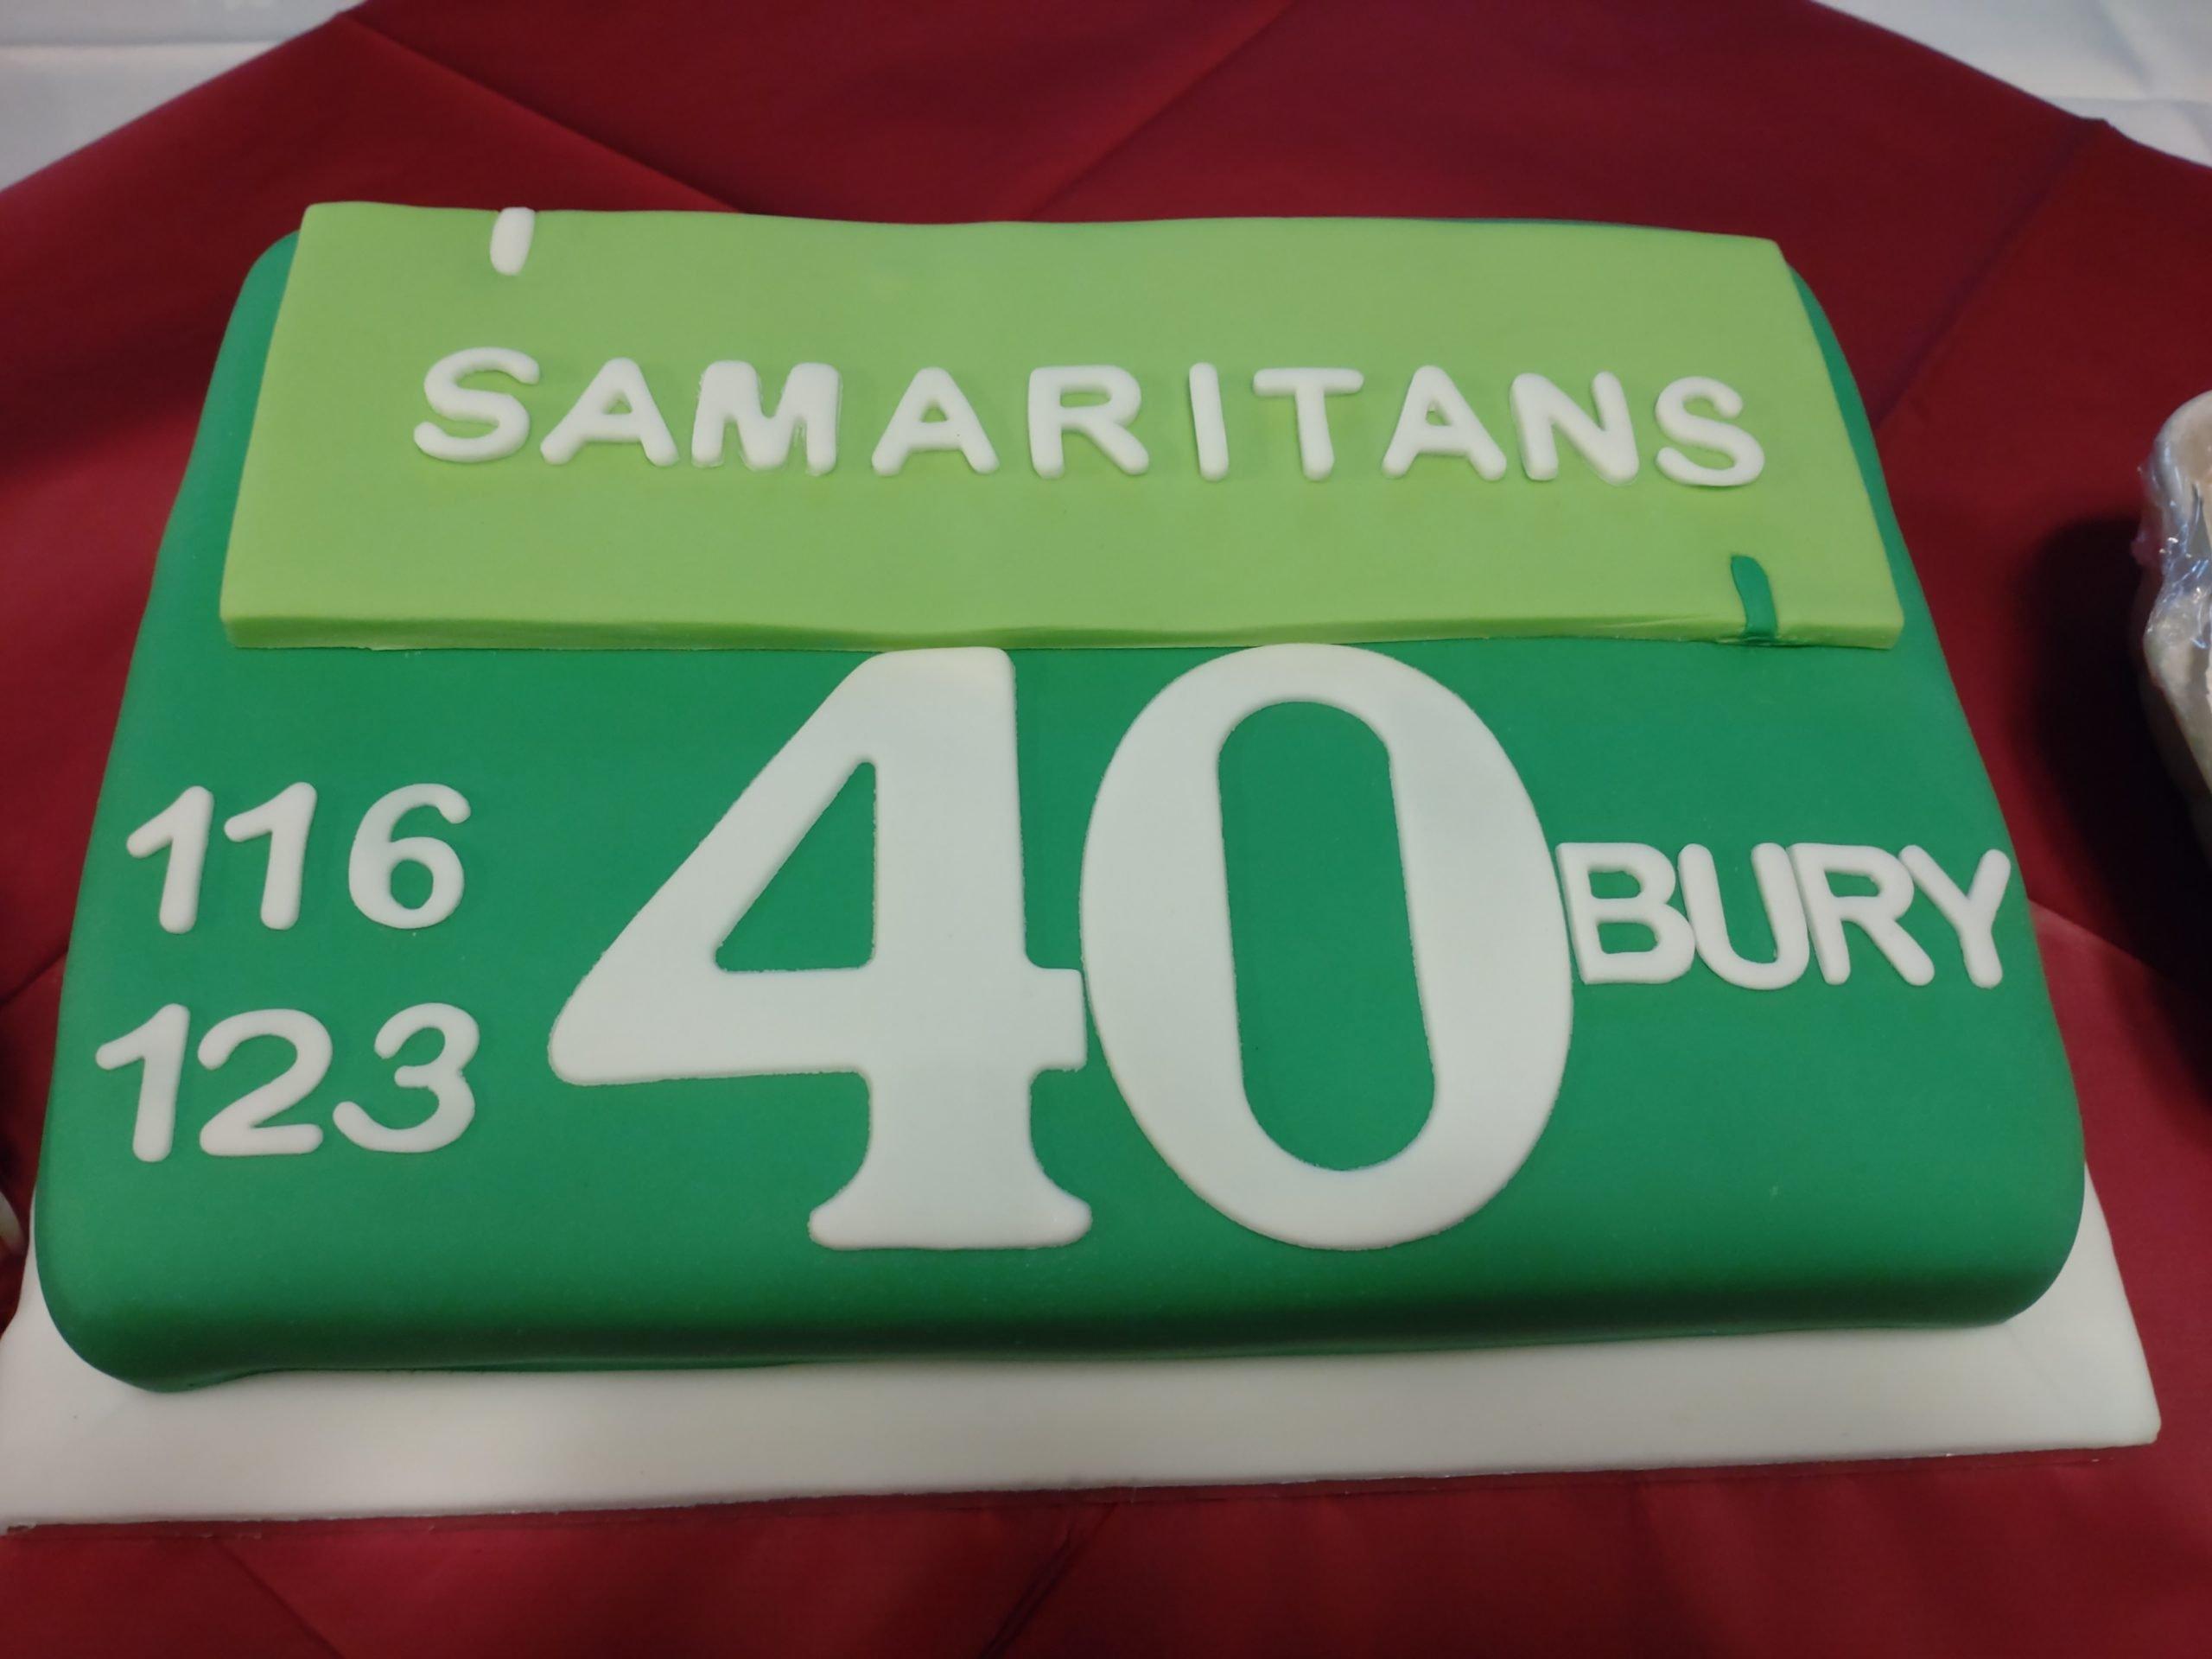 Samaritans Celebrates 40 years in Bury